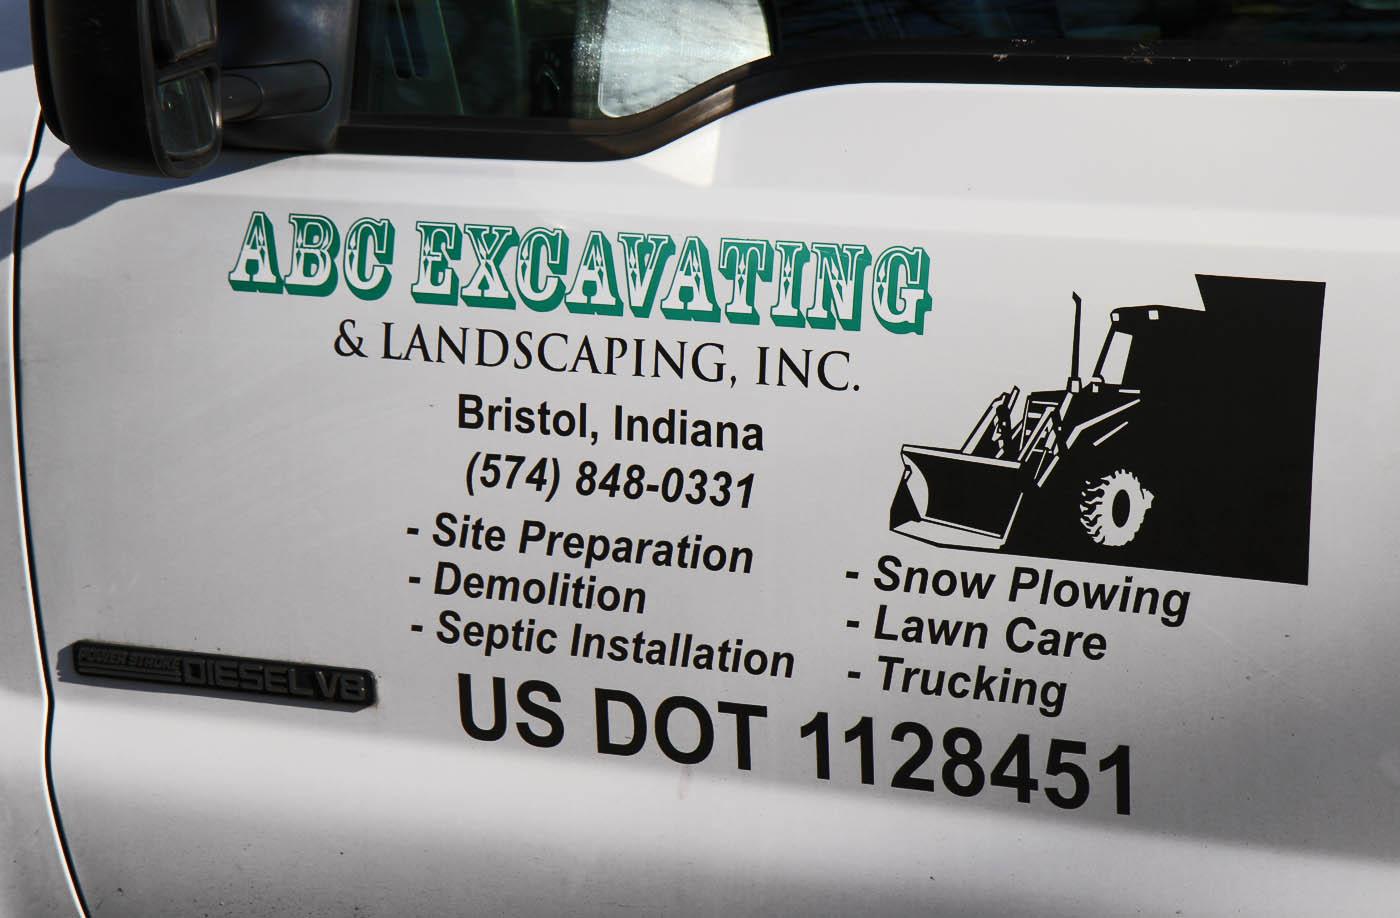 ABC Excavavating